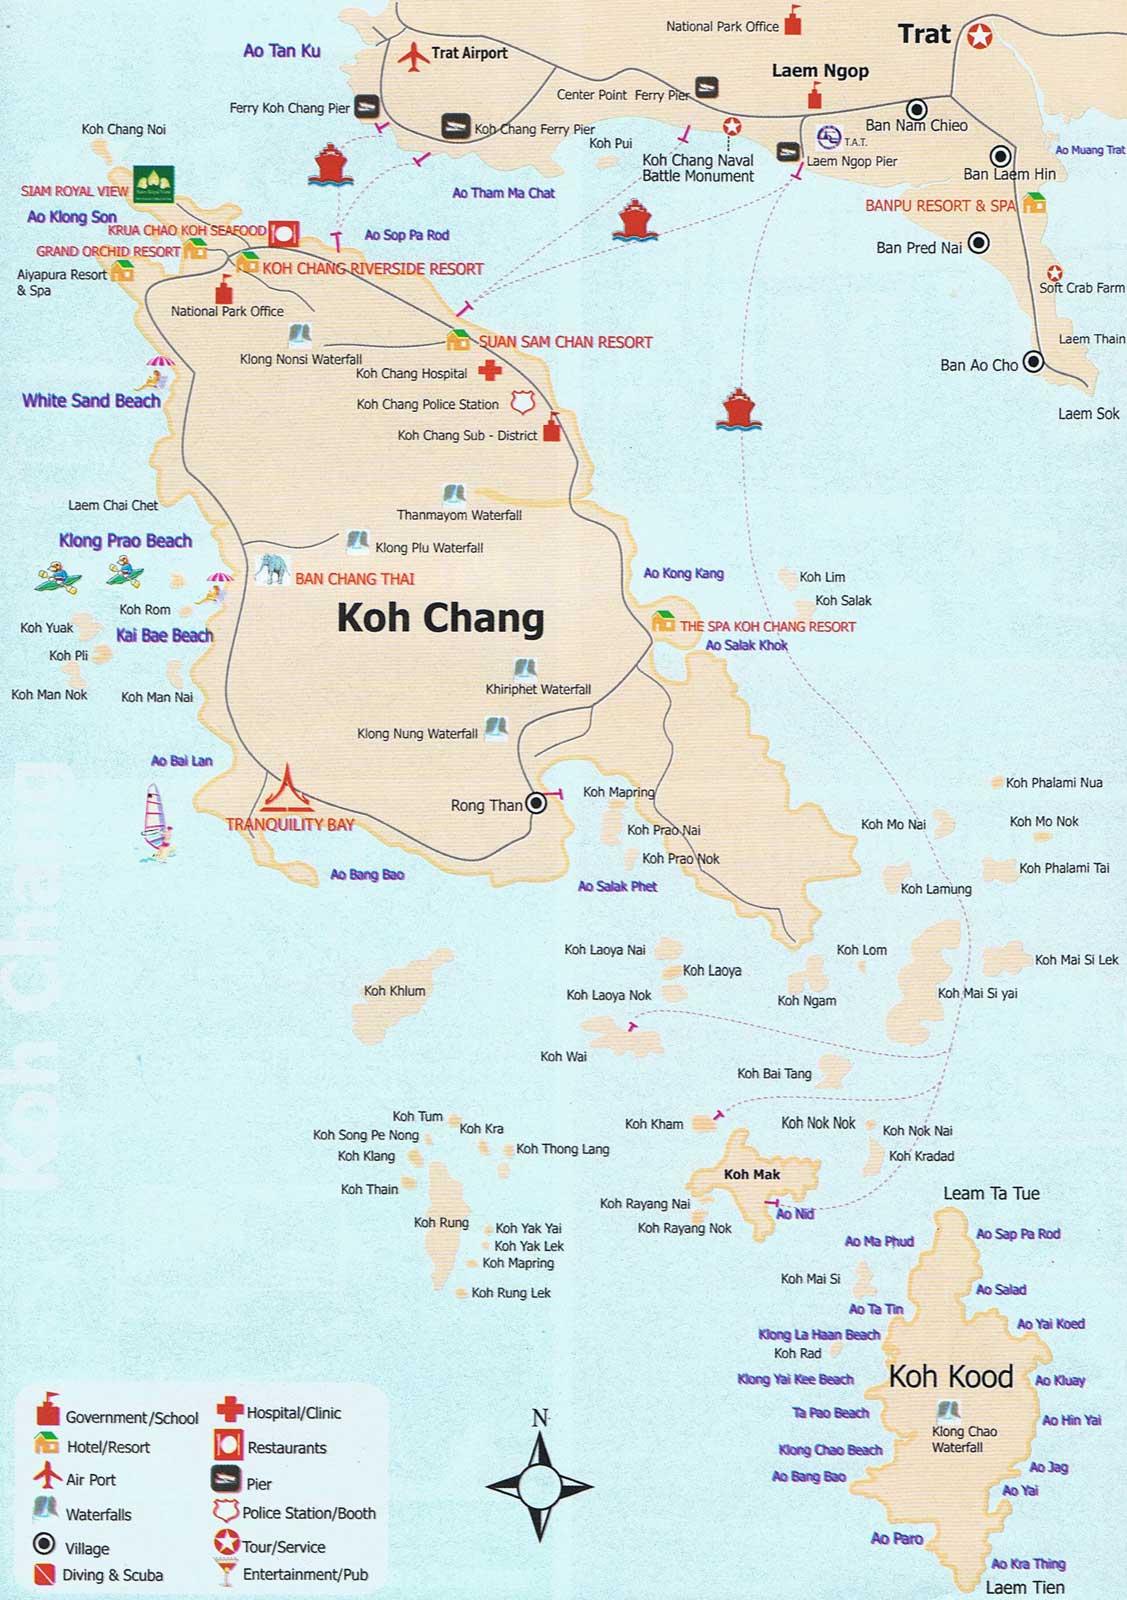 Etajlandia Mapy Tajlandii